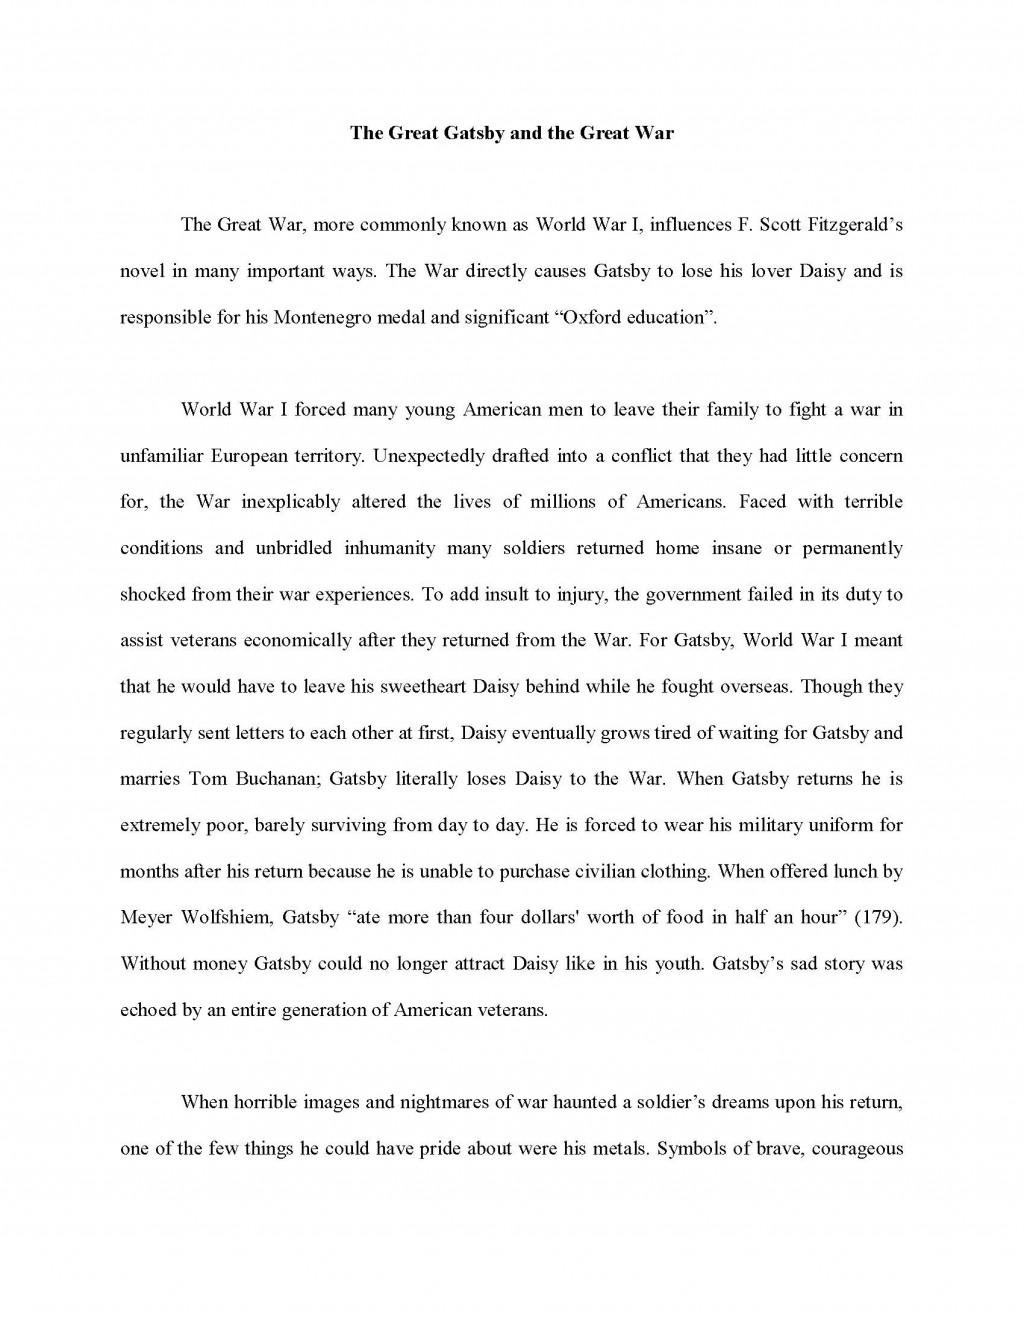 009 Lyric Essays Informative Sample Awesome Essay Examples Large